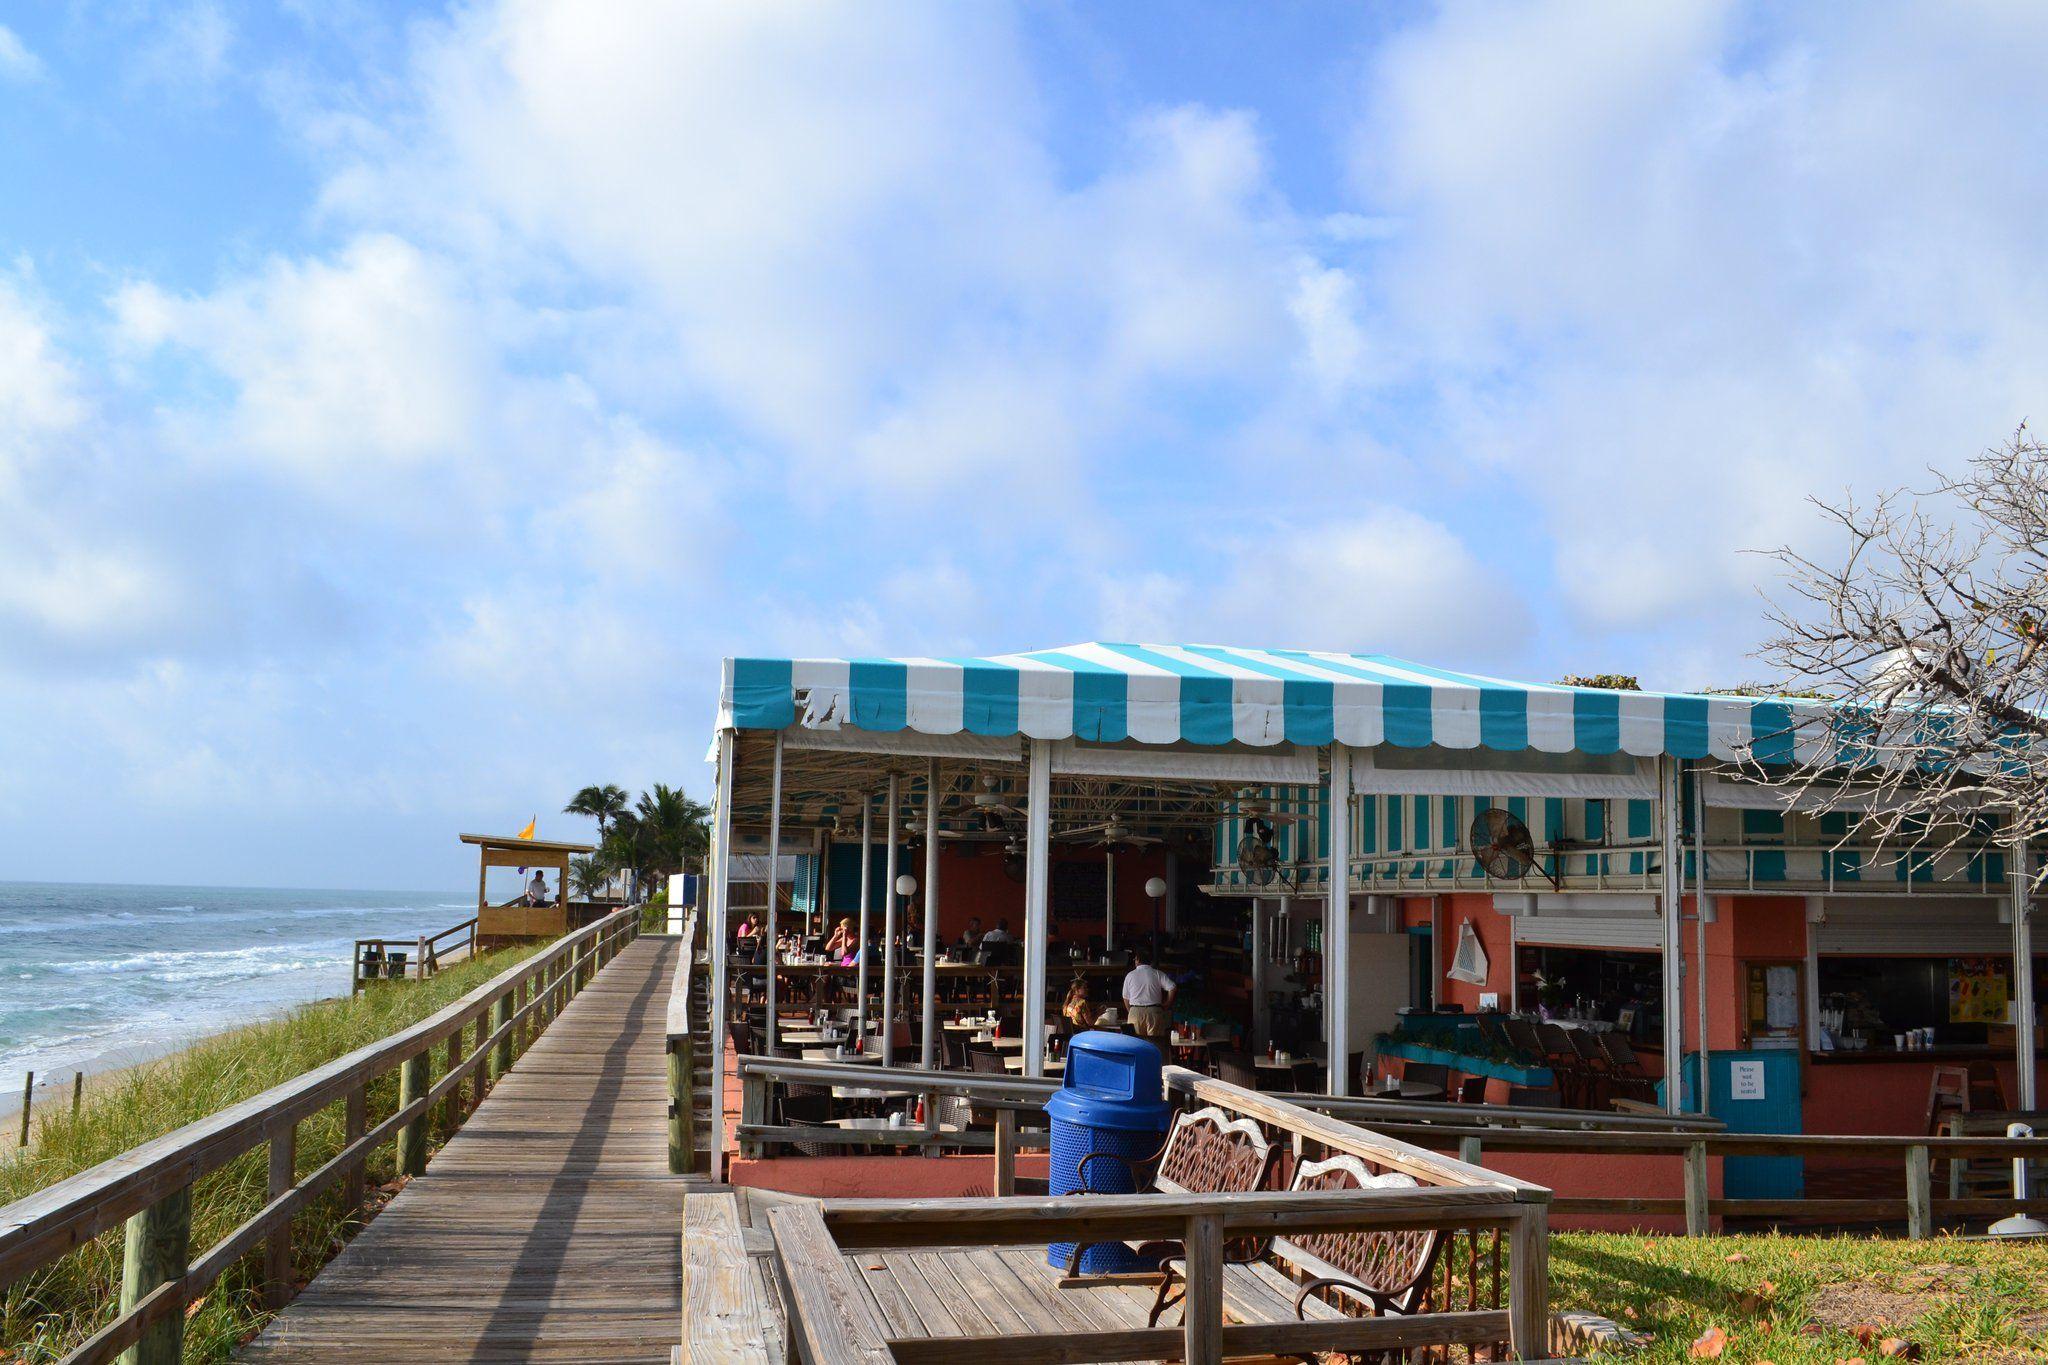 6964a280ea06dbf46d86cec18d7bb4f9 - Breakfast Places In Palm Beach Gardens